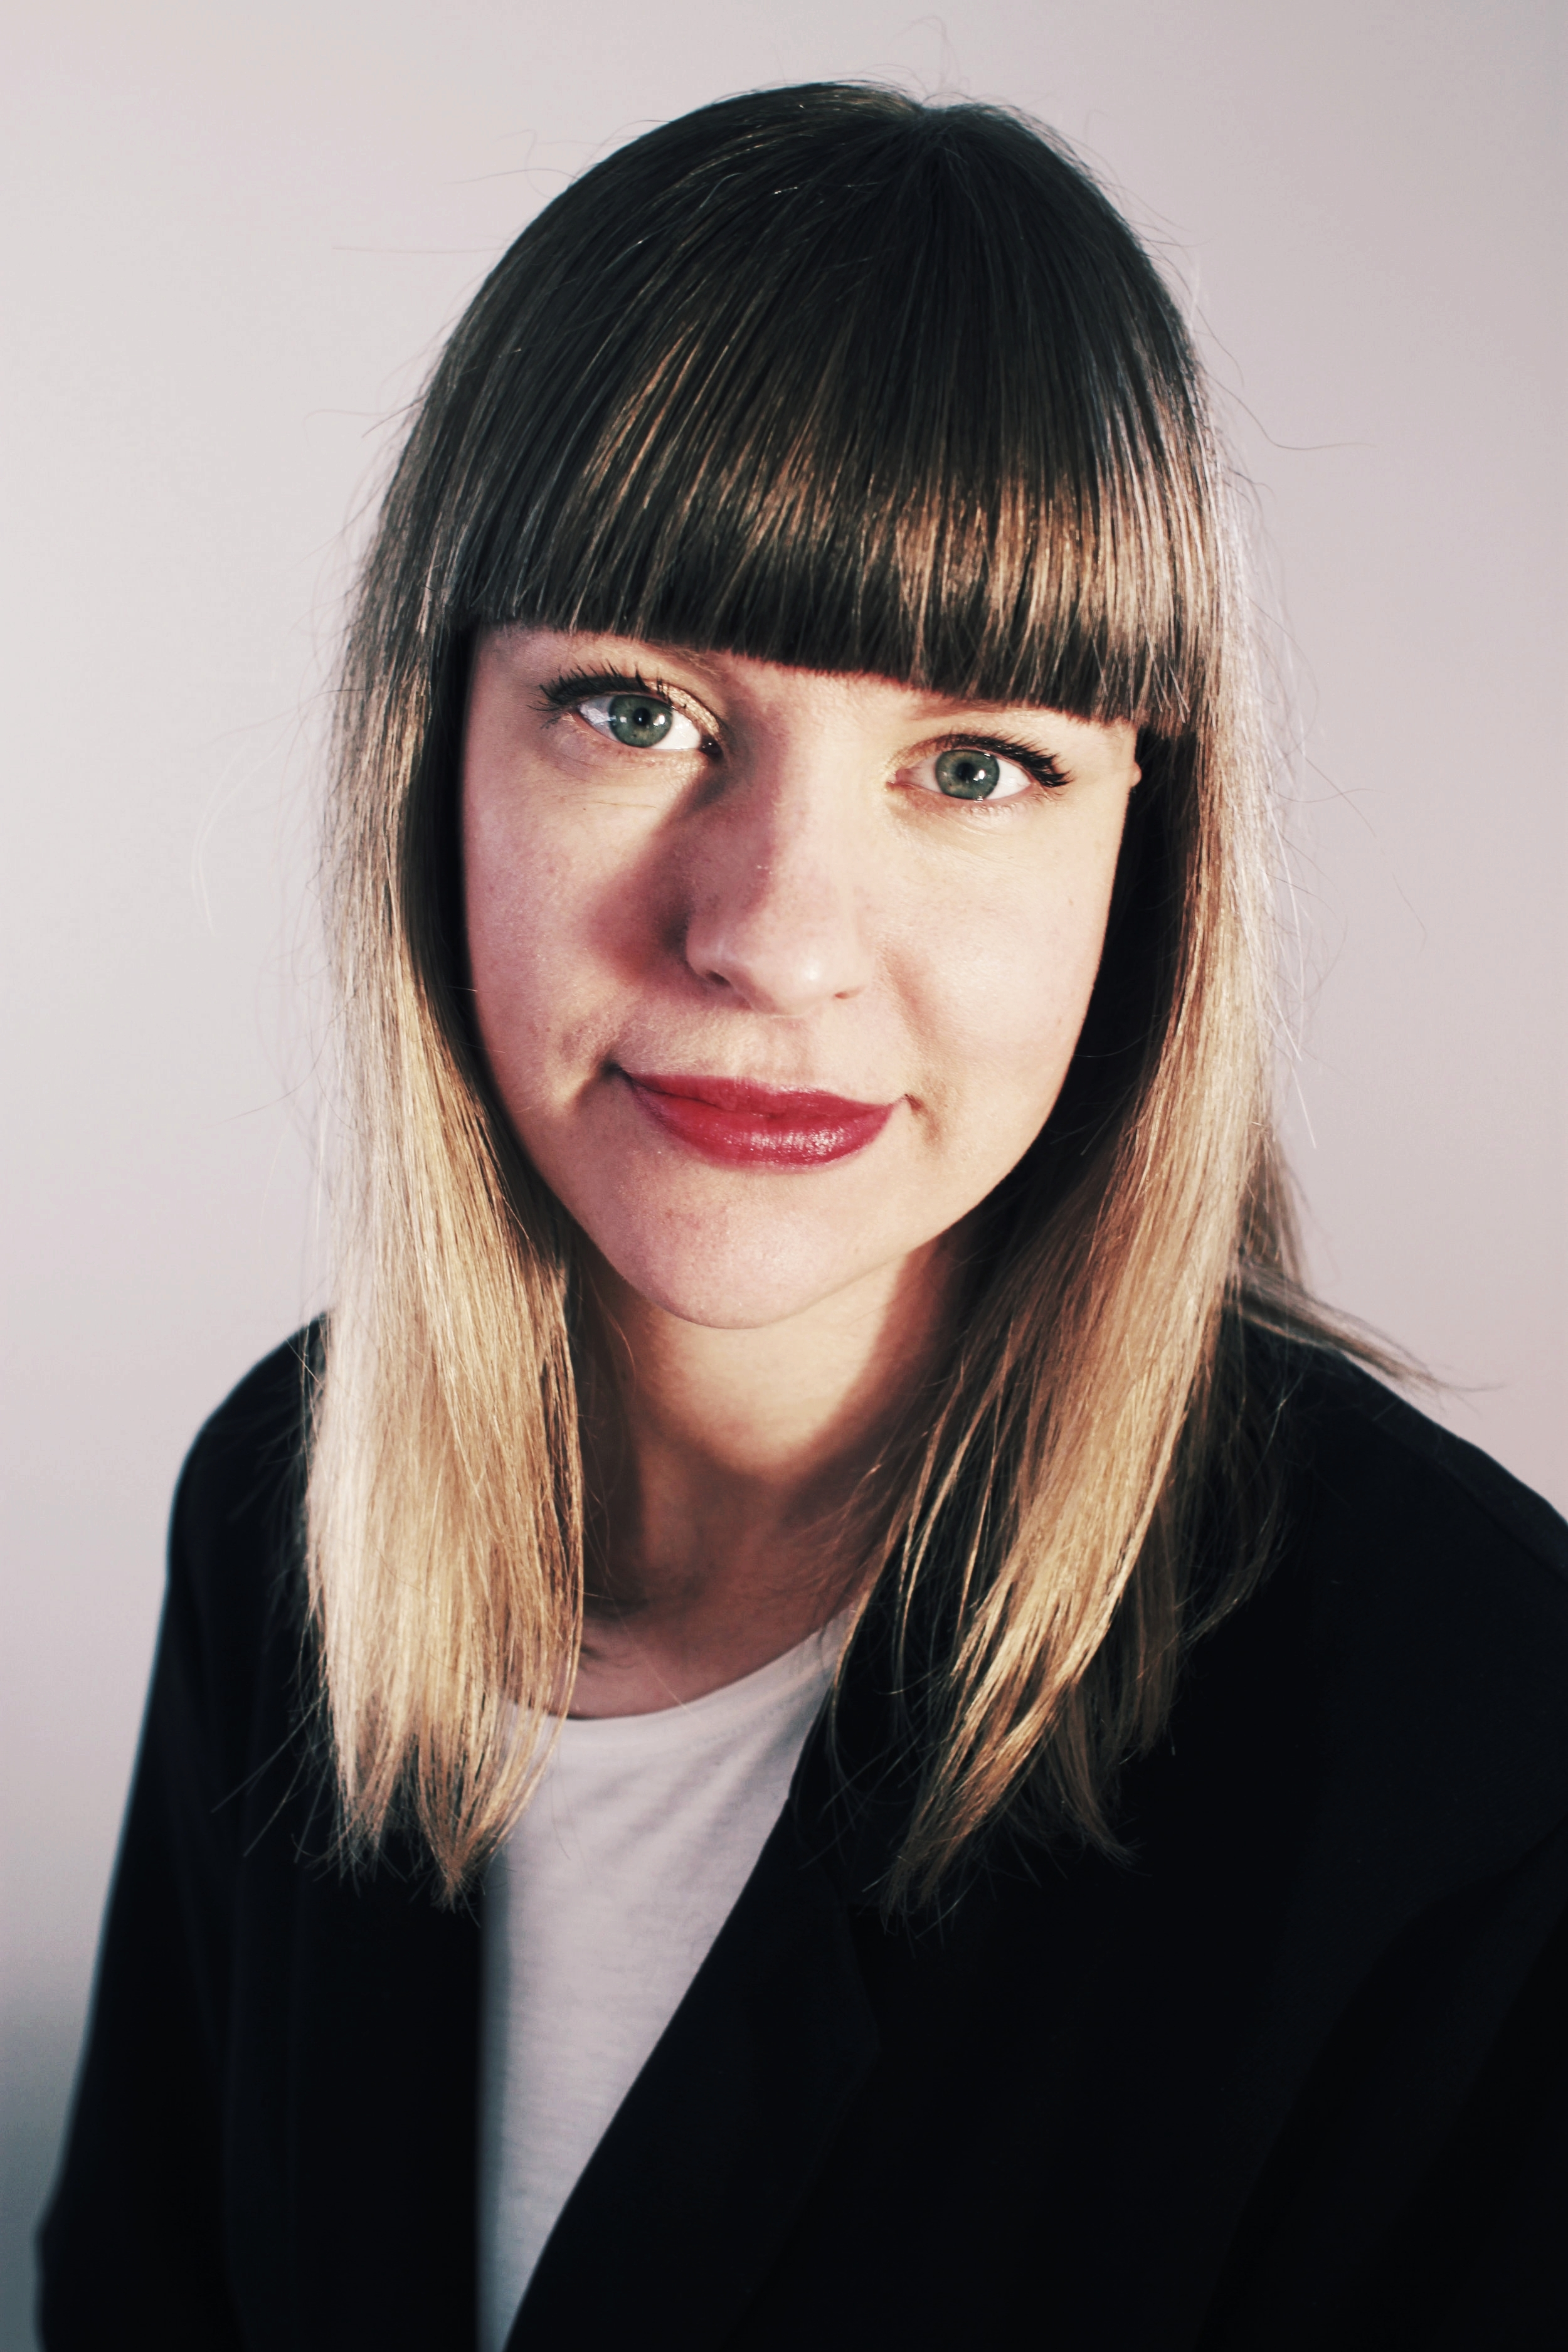 Mia Bäcklin